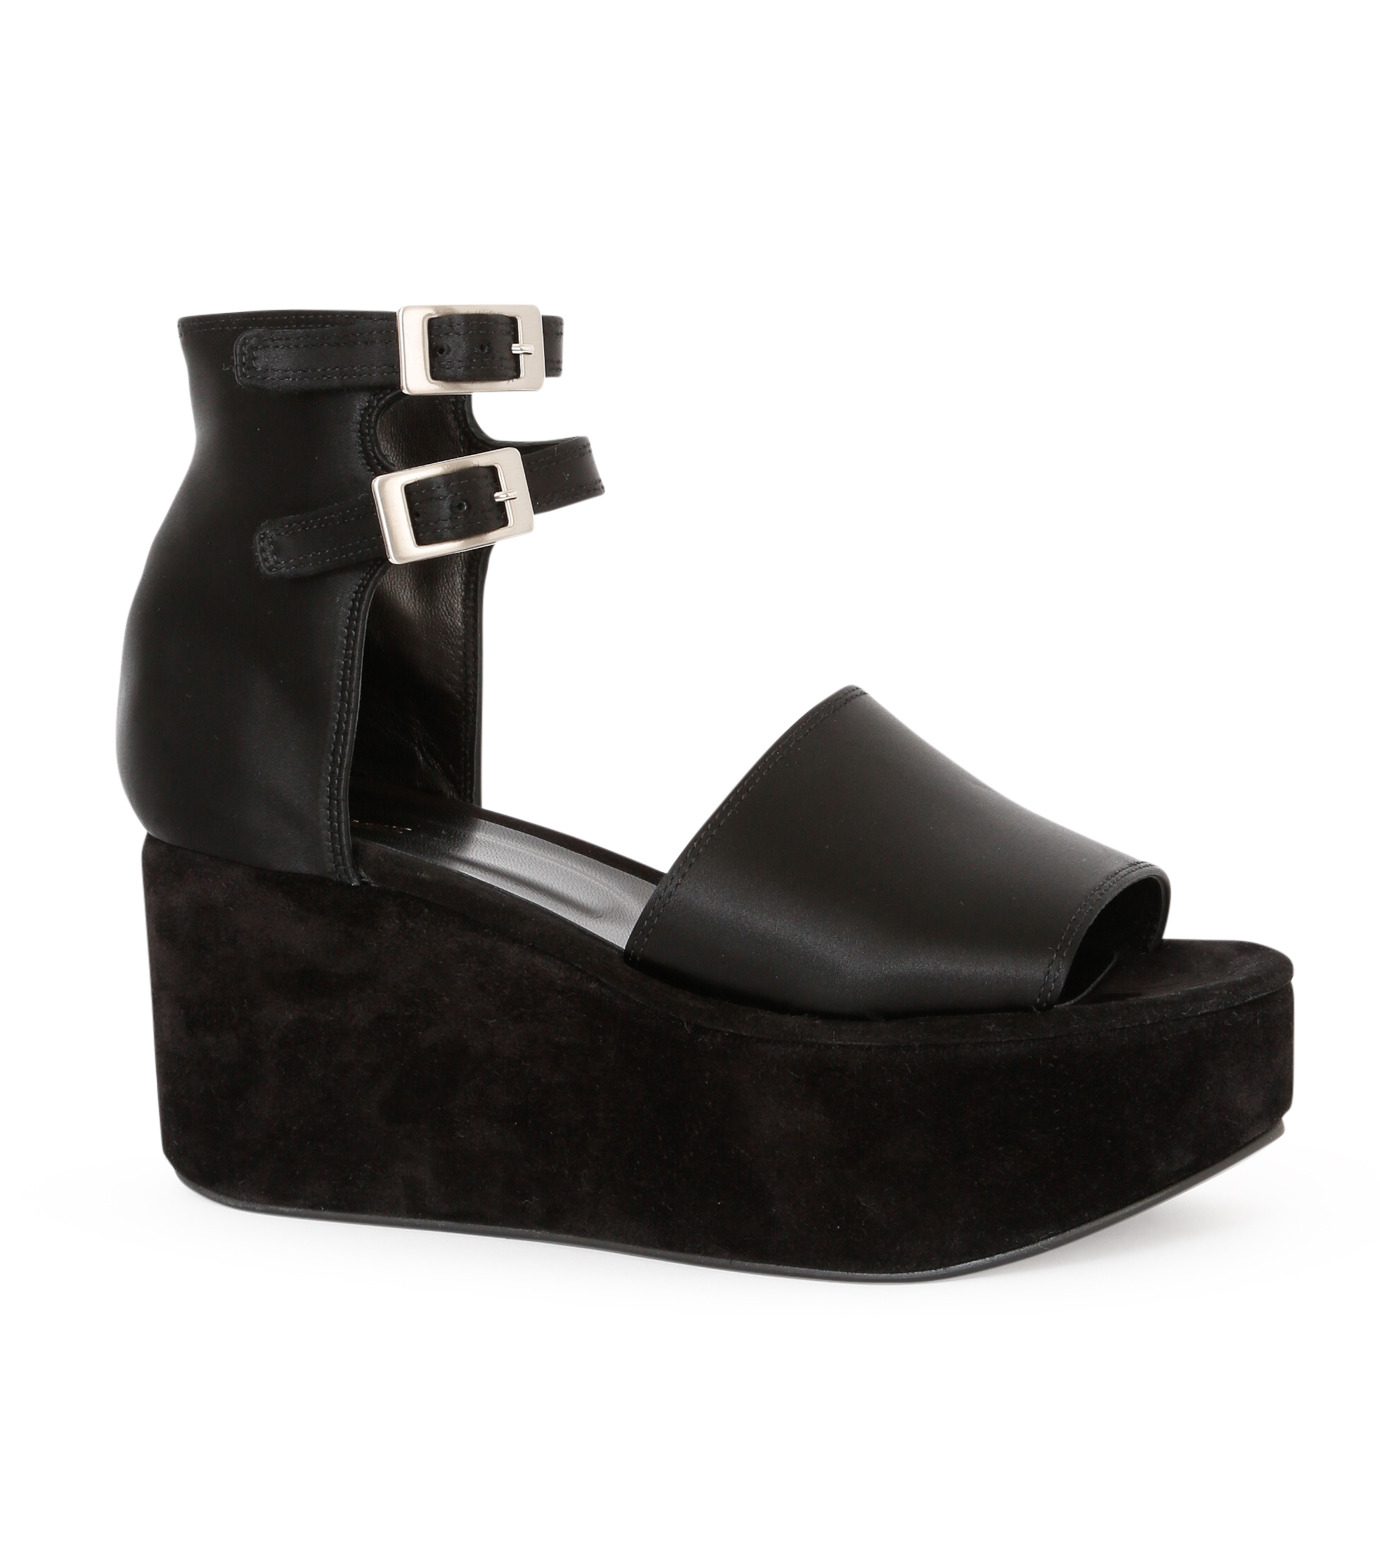 PIPPICHIC(ピッピシック)のSatin Sandal-BLACK(フラットシューズ/Flat shoes)-P16-PAUL25-L 拡大詳細画像1